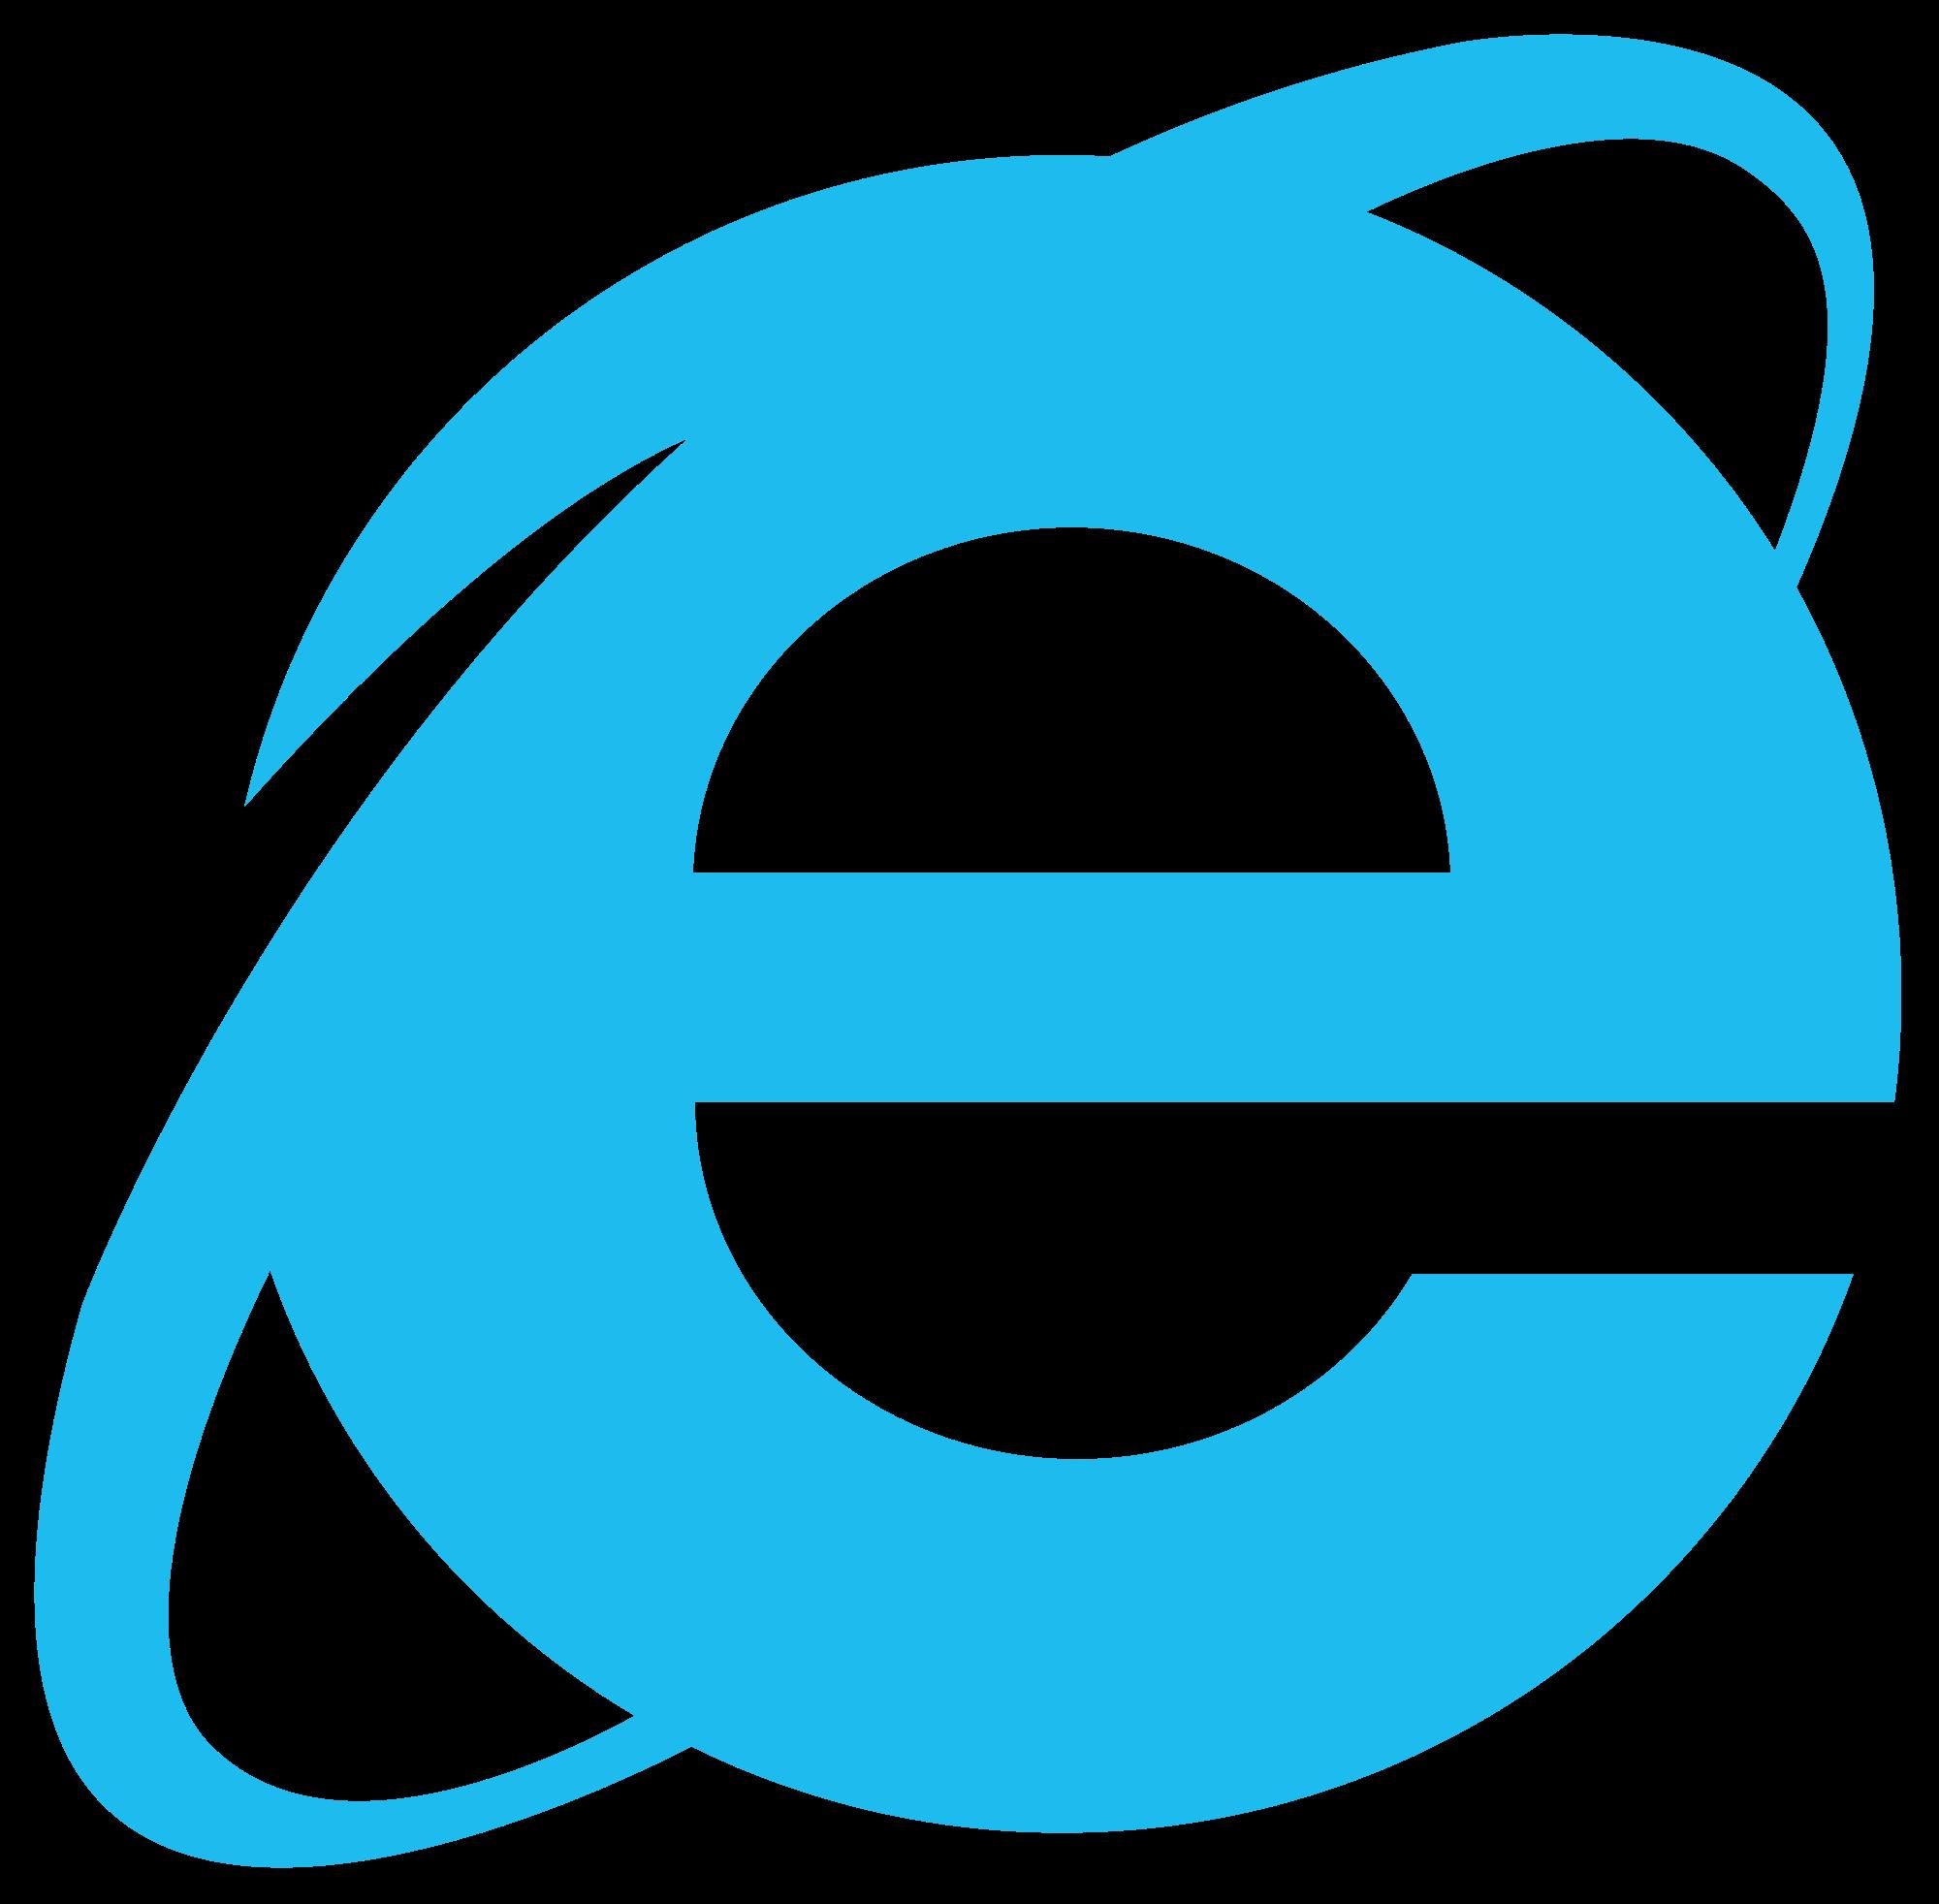 Website clipart internet explorer, Website internet explorer.